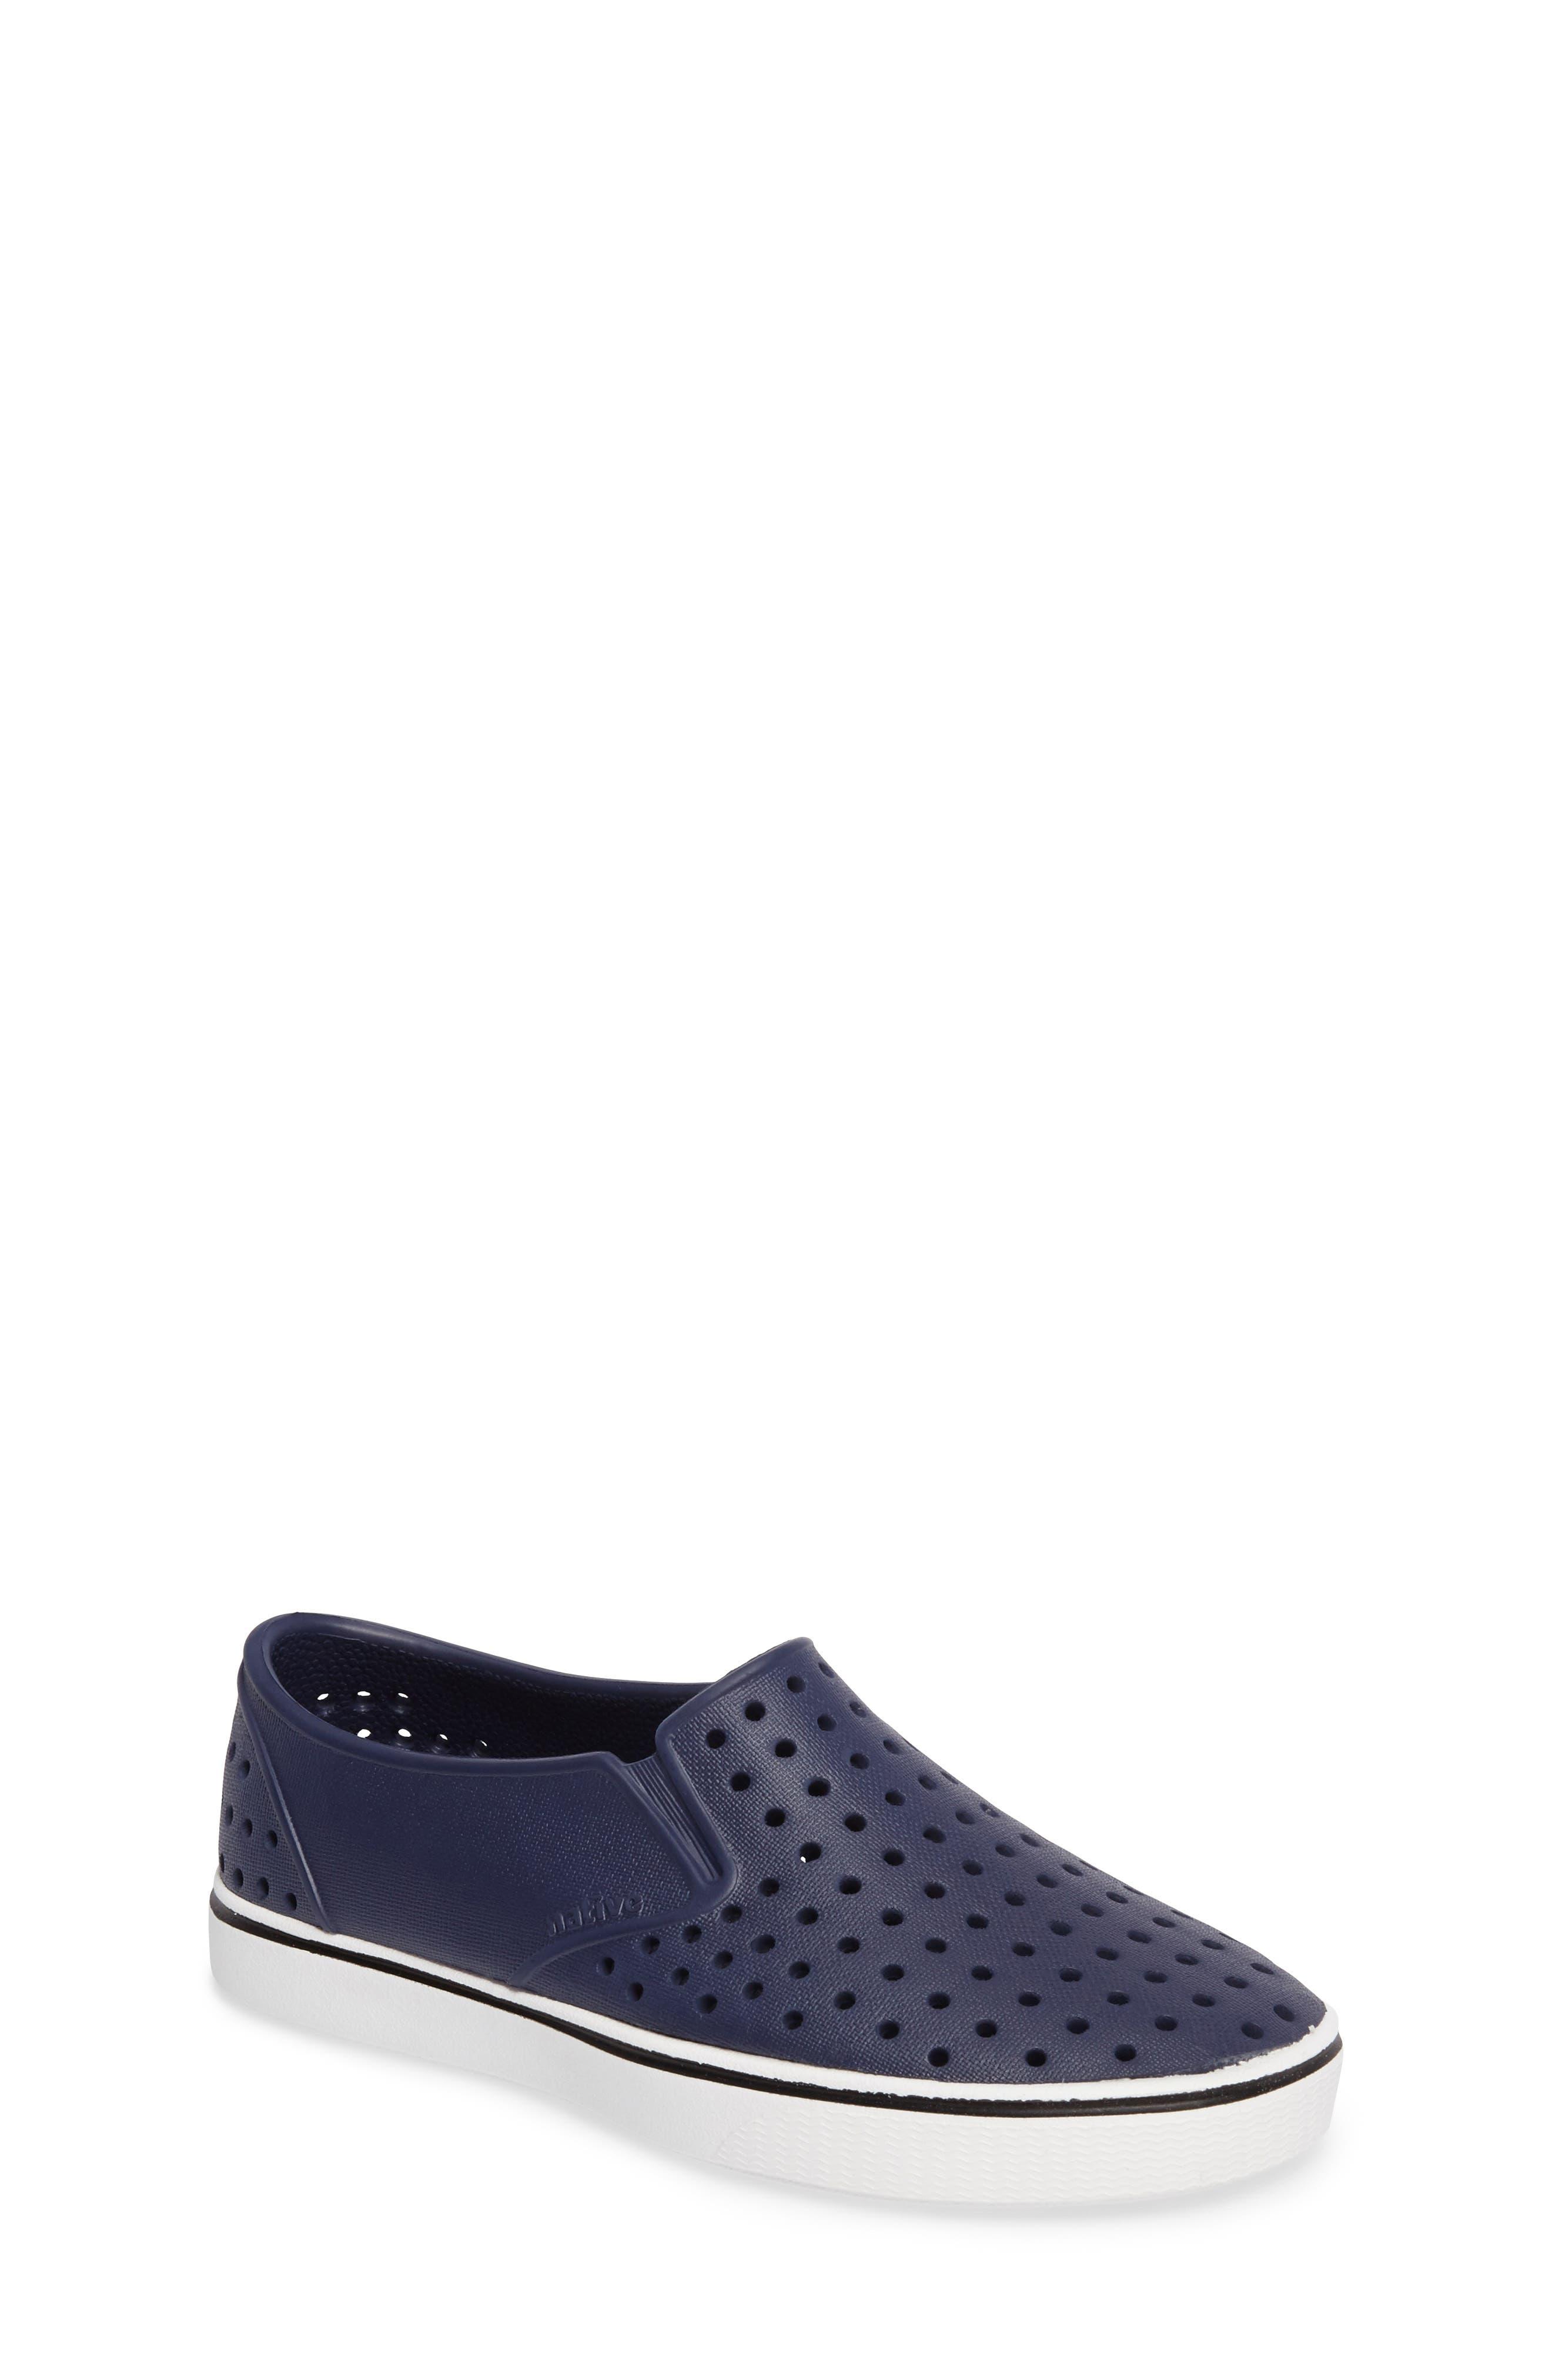 Main Image - Native Shoes Miles Slip-On Sneaker (Little Kid)